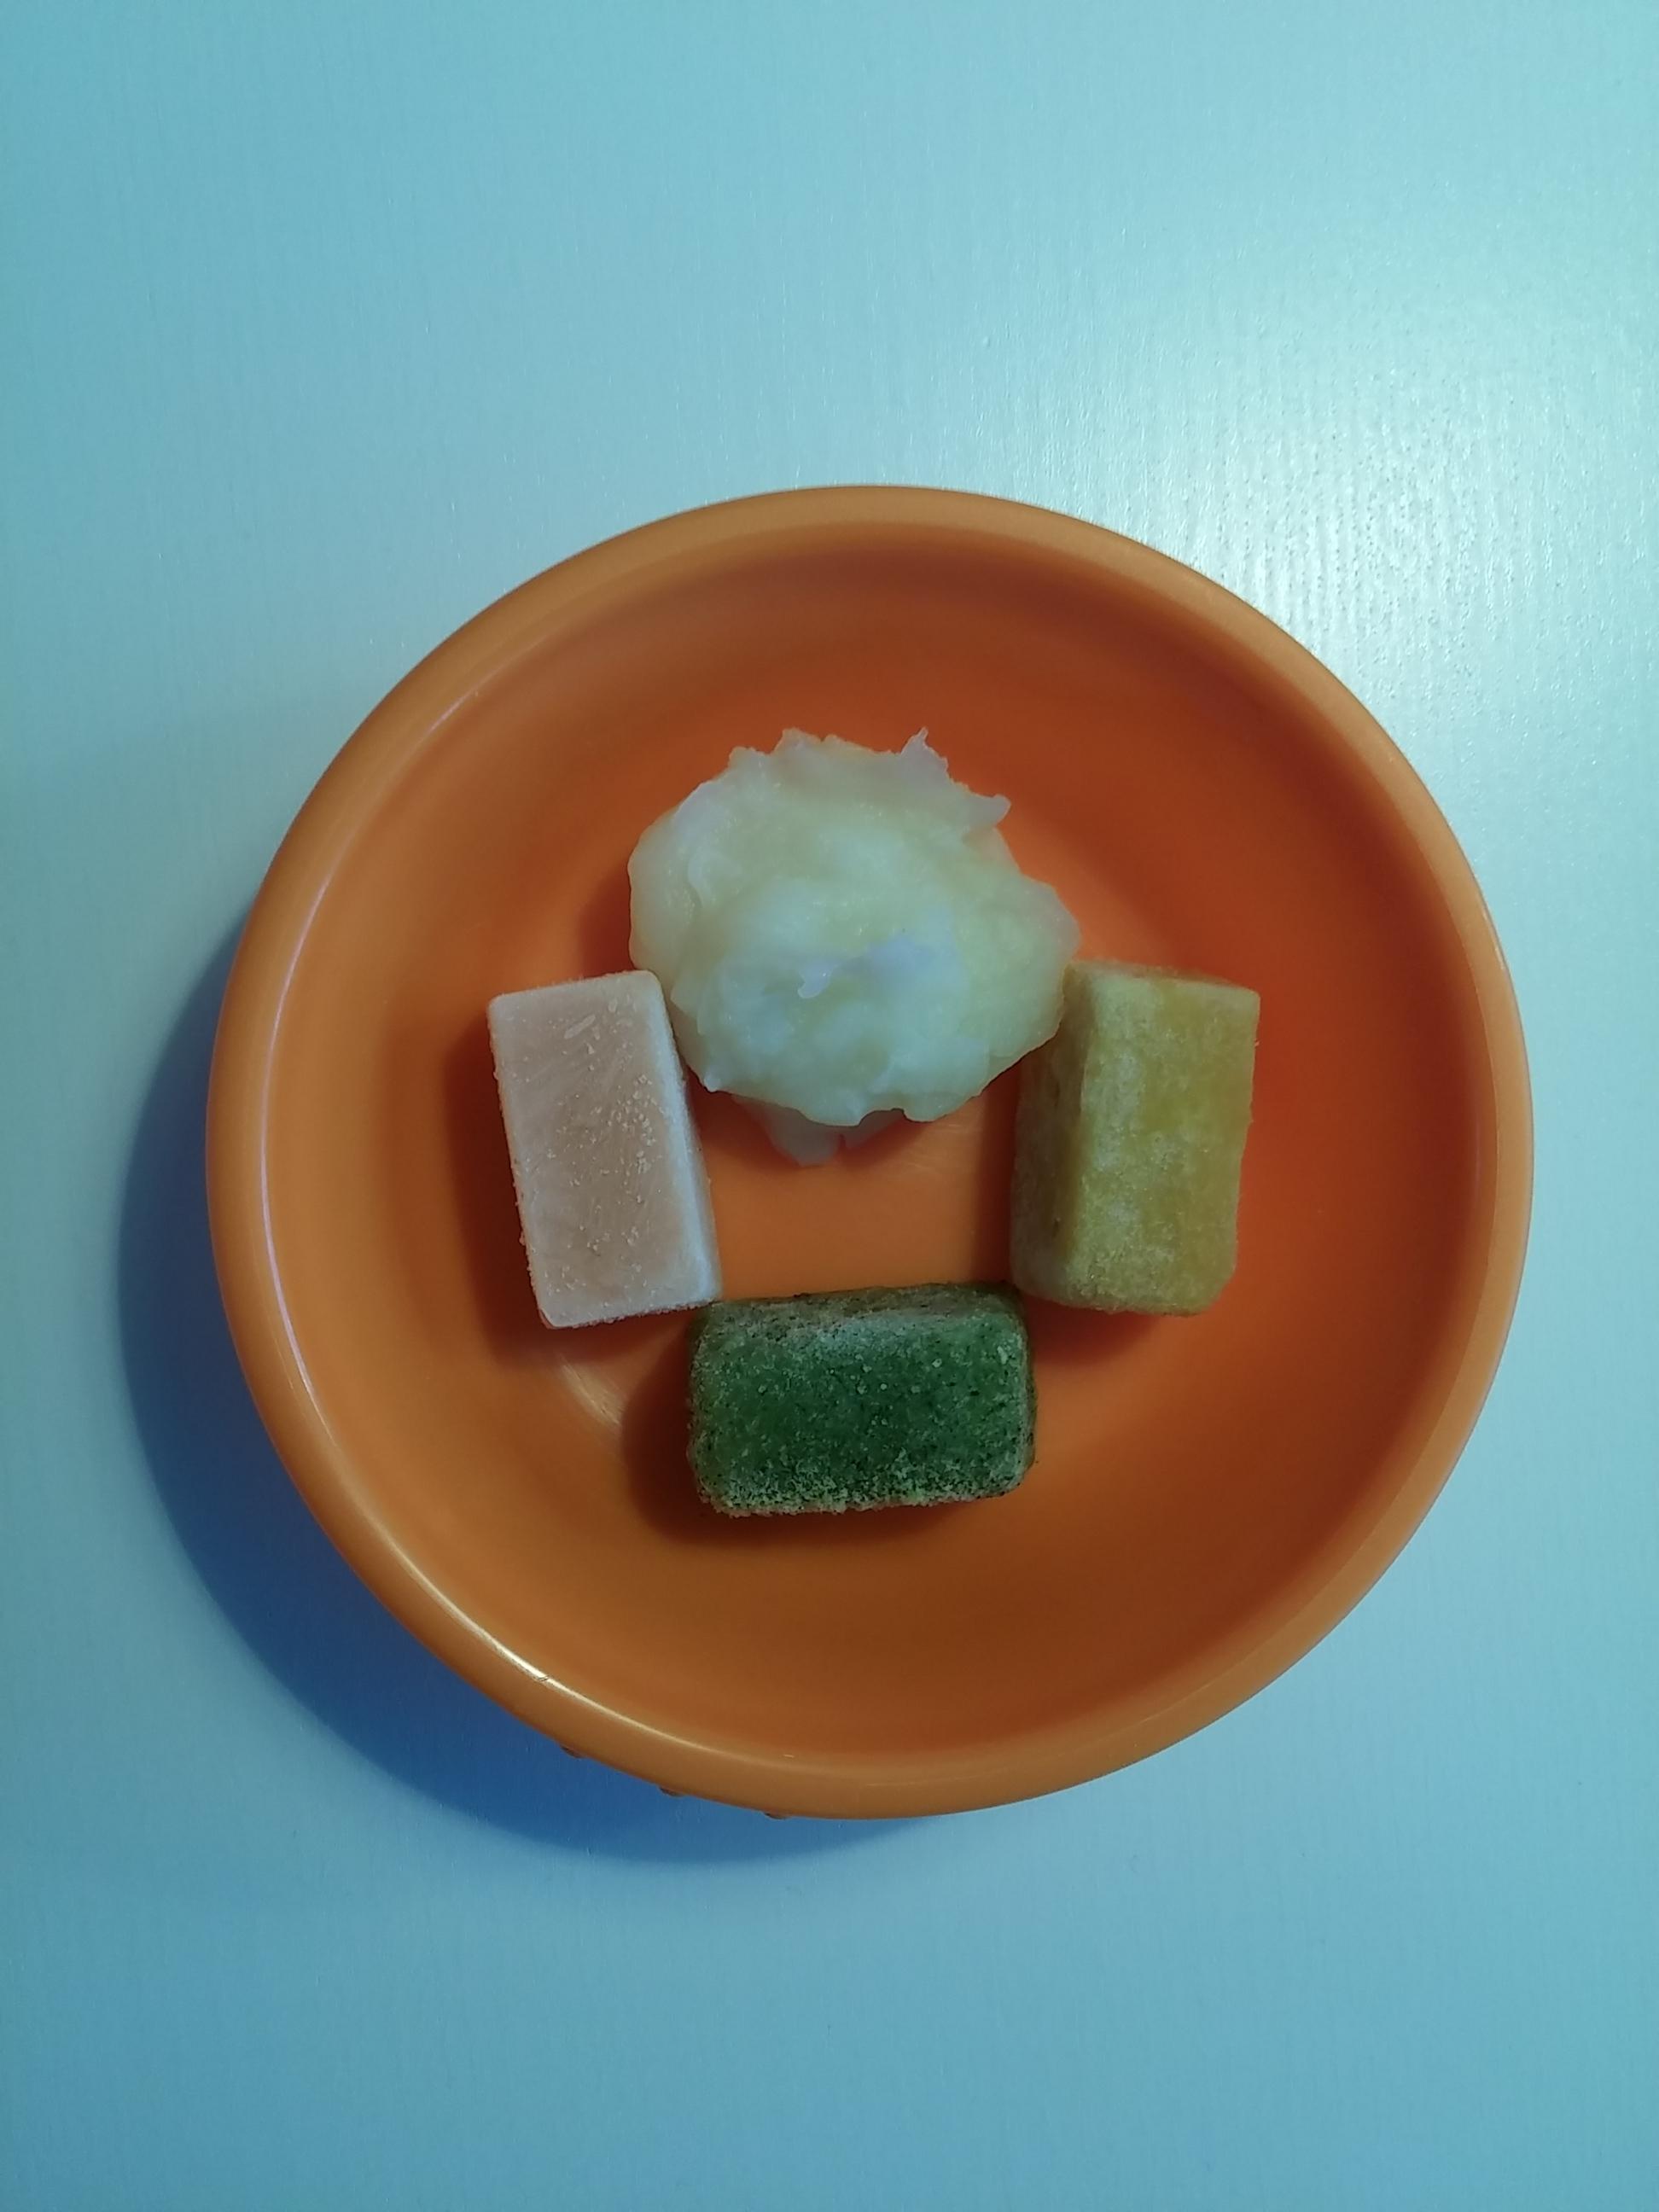 Salmon, green beans, sweetcorn and mashed potato